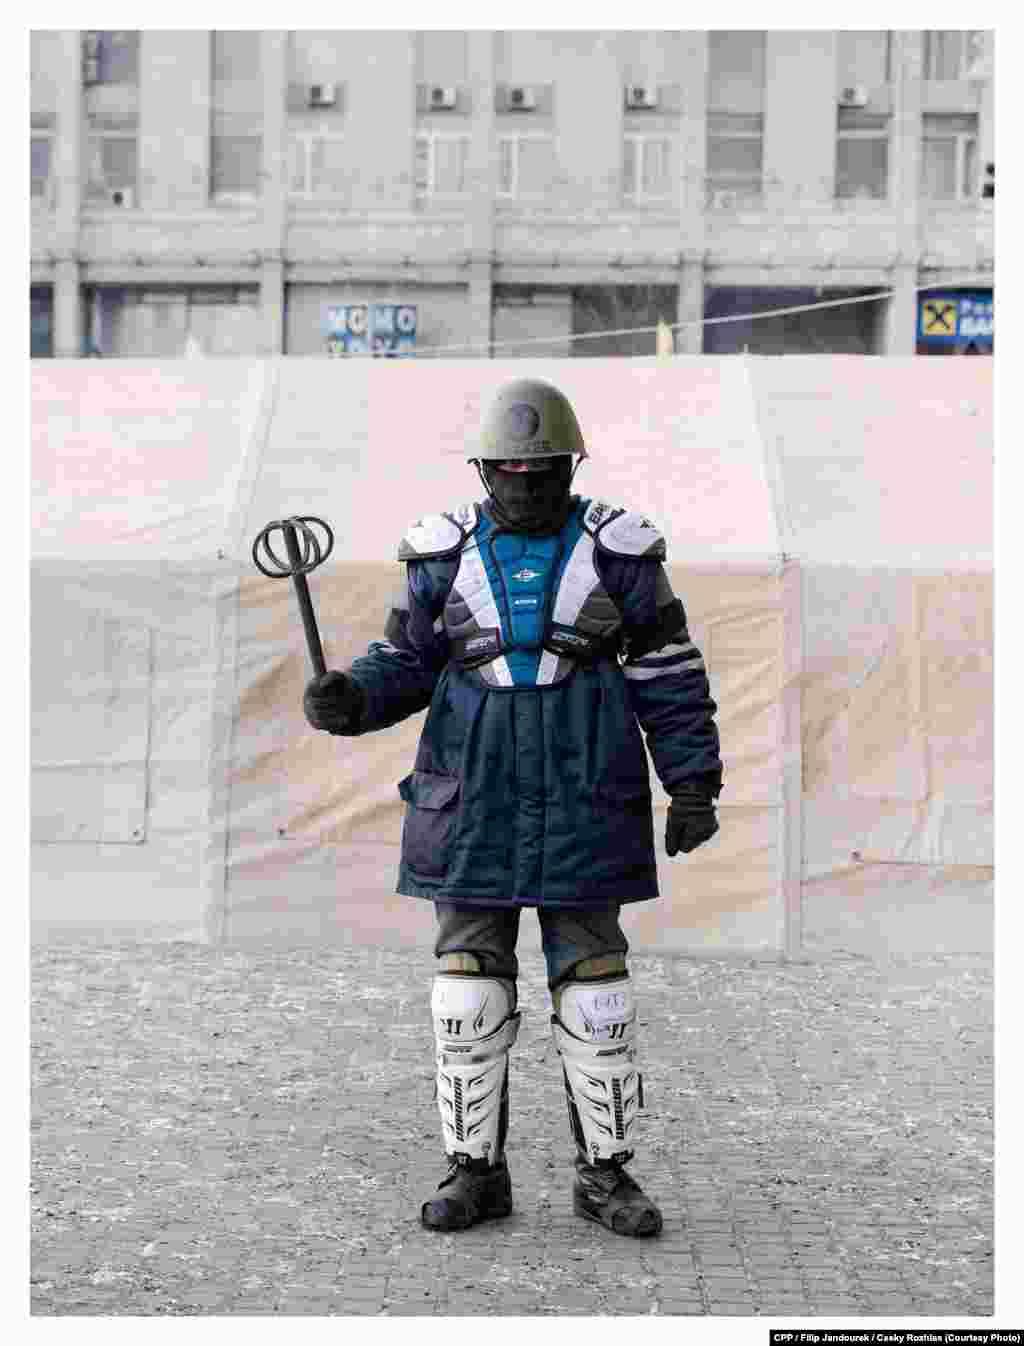 "First Prize,Portrait:From a series titled ""Many Faces of the Ukrainian Revolution"" (Cesky Rozhlas/Filip Jandourek)"